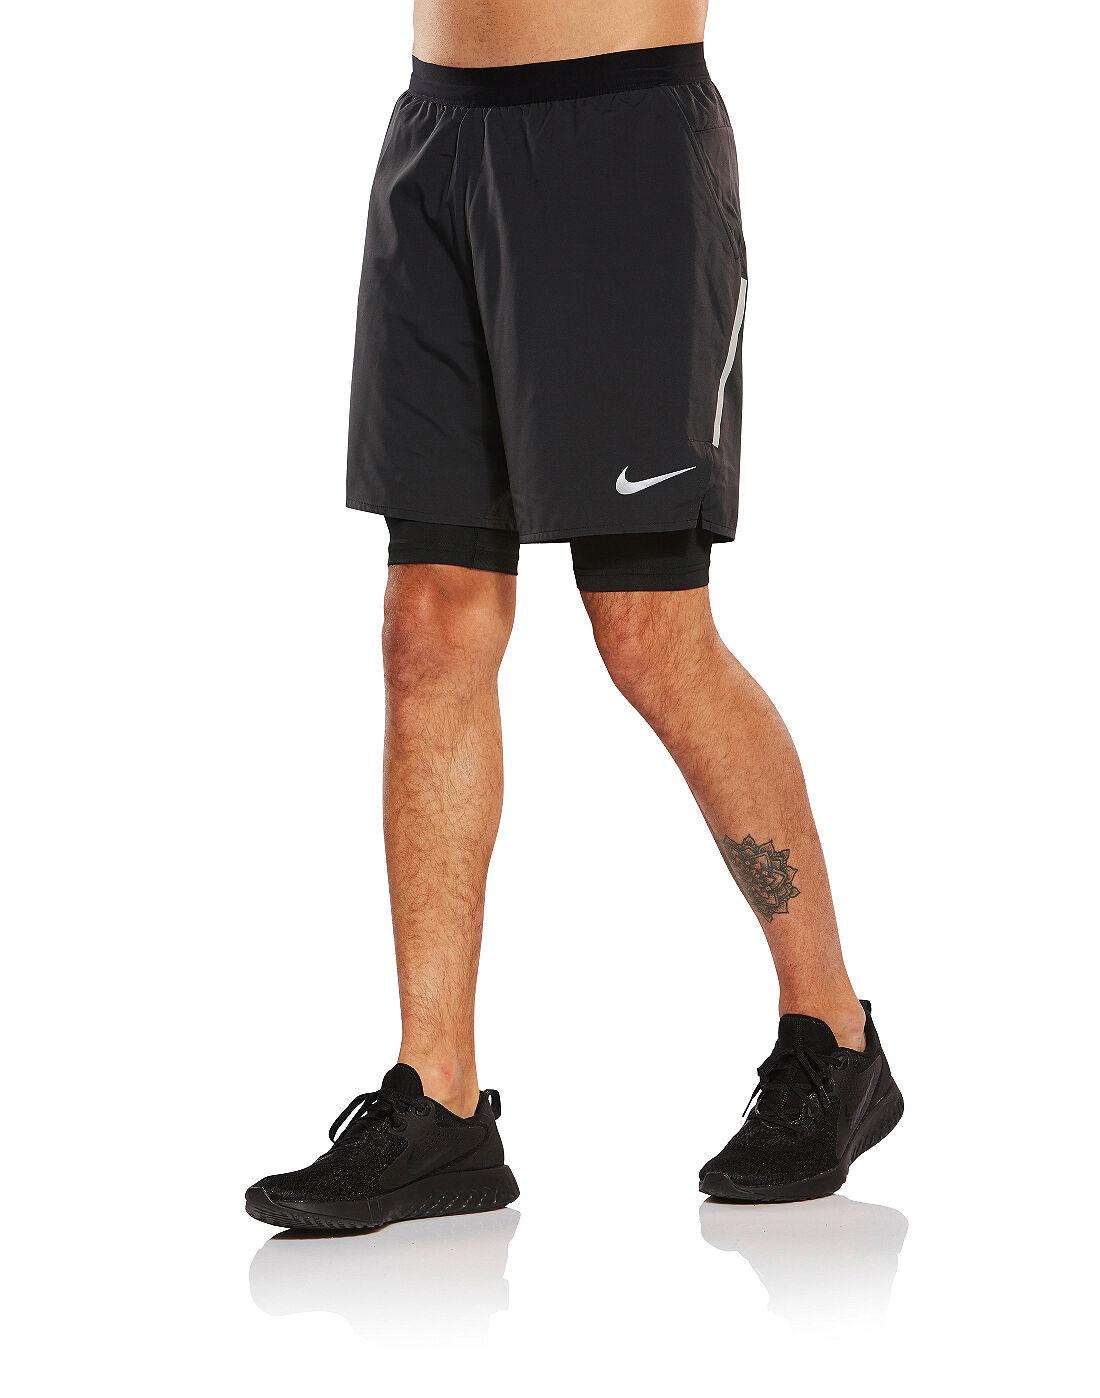 Men's Nike Flex Distance 2 in 1 Shorts   Black   Life Style ...